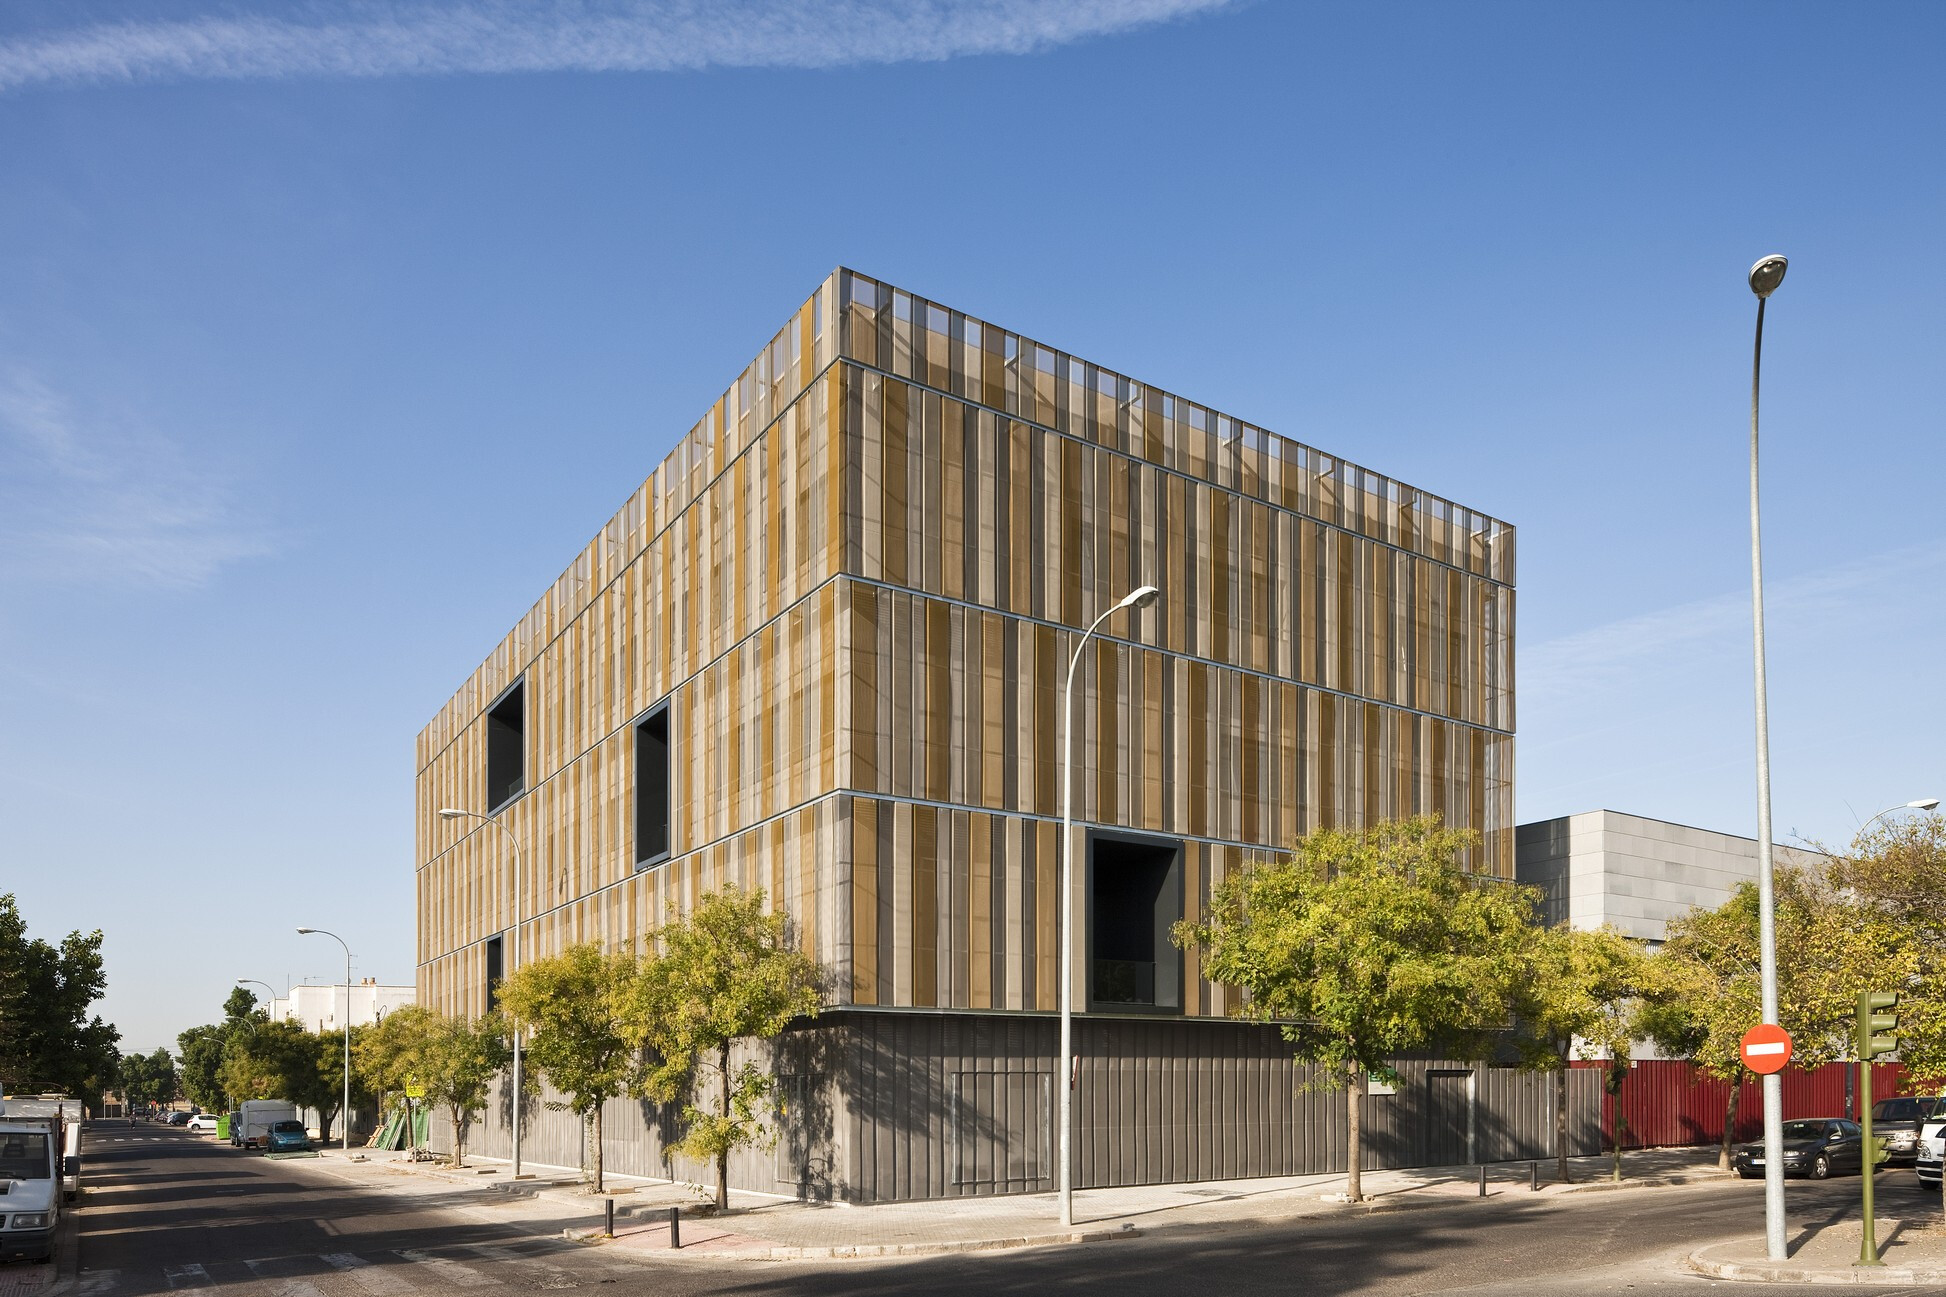 Social Building in Avenida de la Paz in Seville